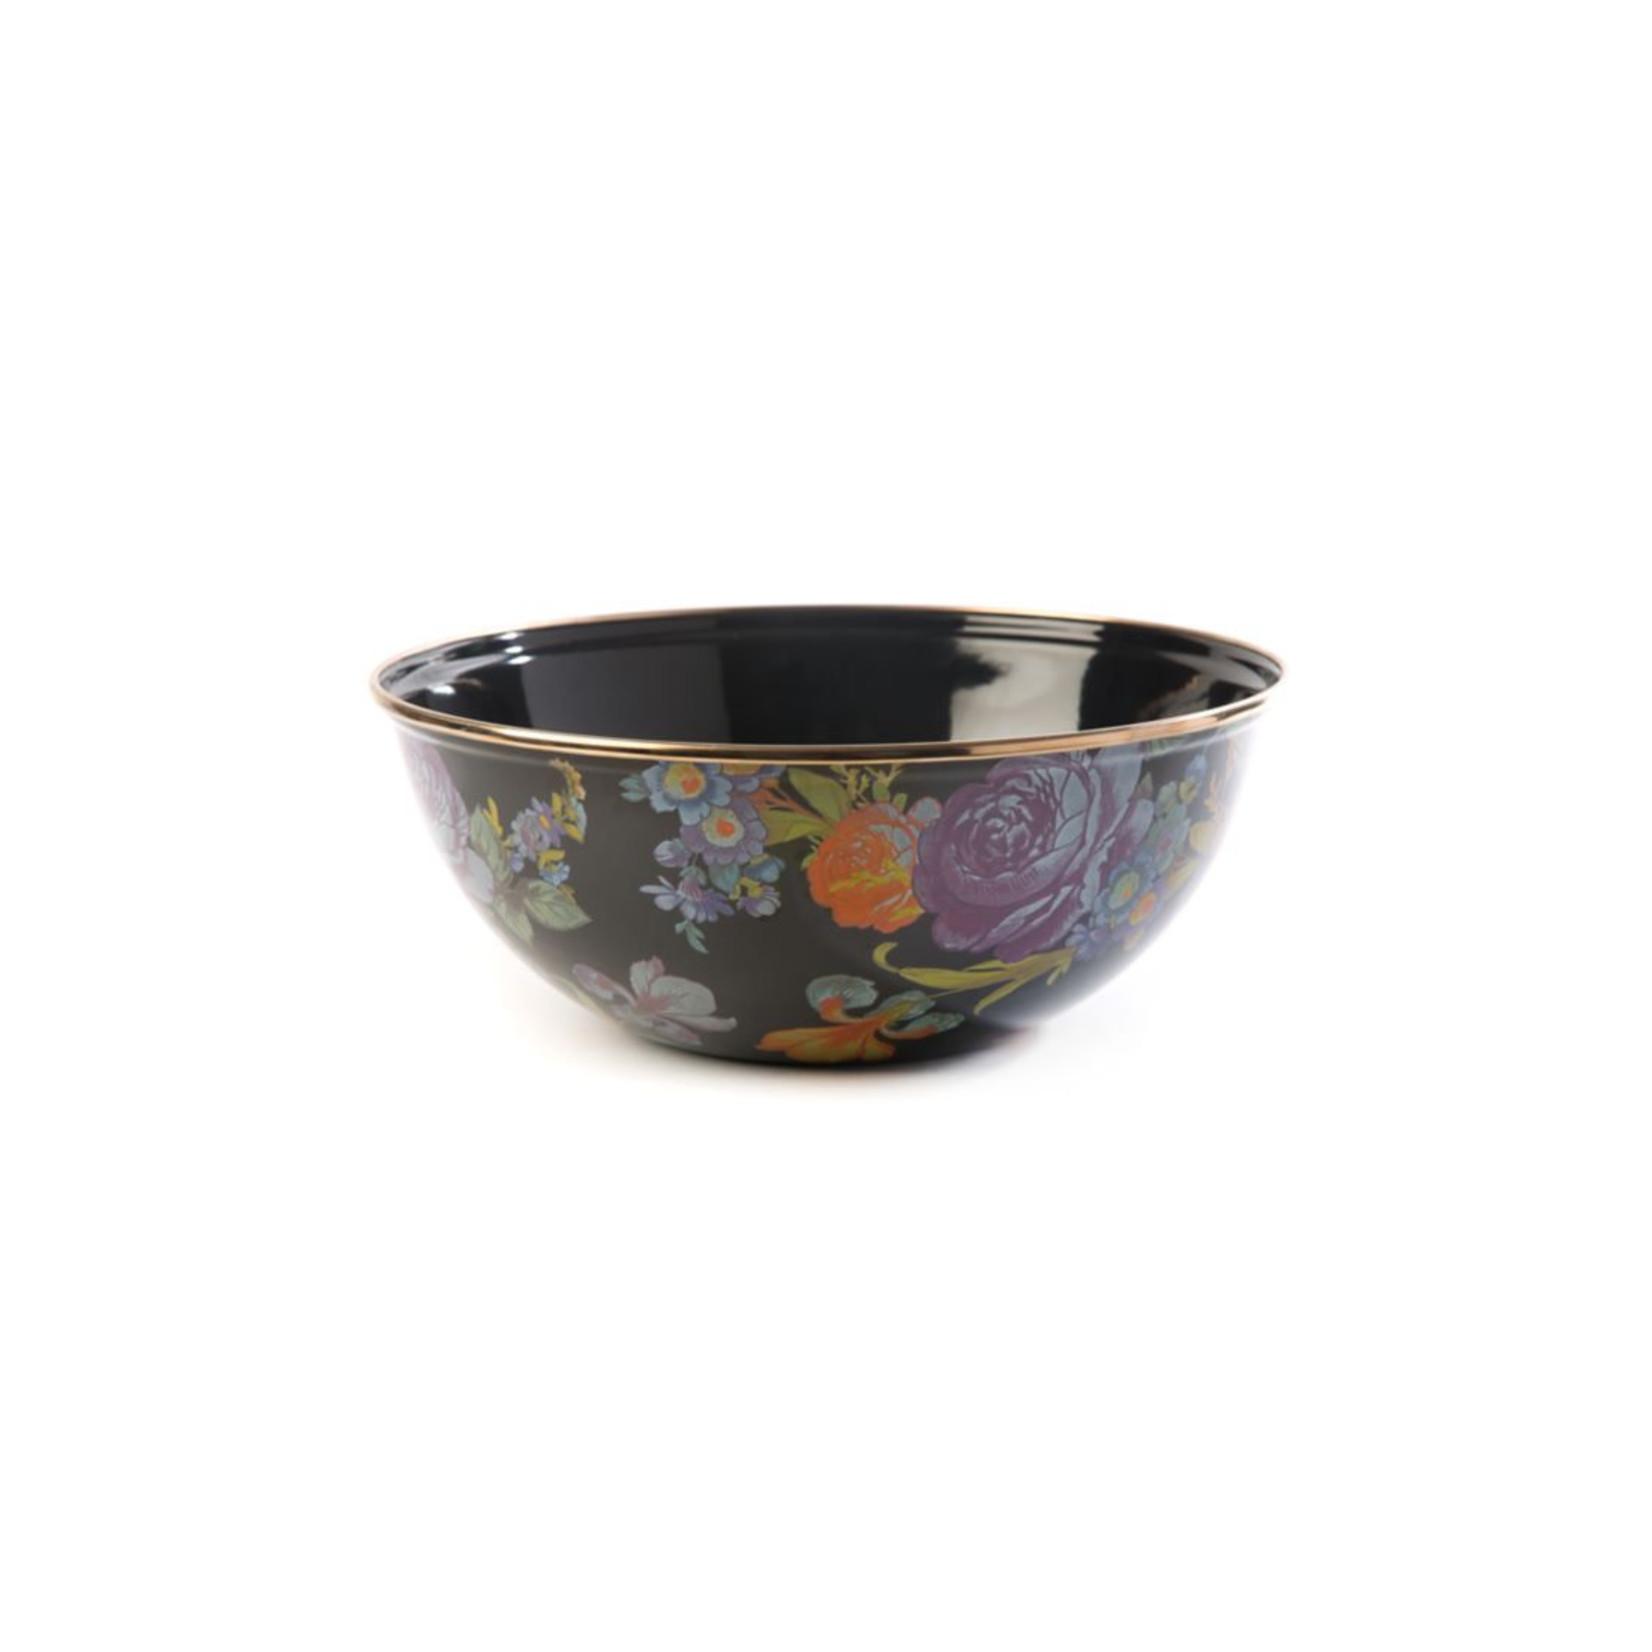 MacKenzie Childs Flower Market Medium Everyday Bowl - Black